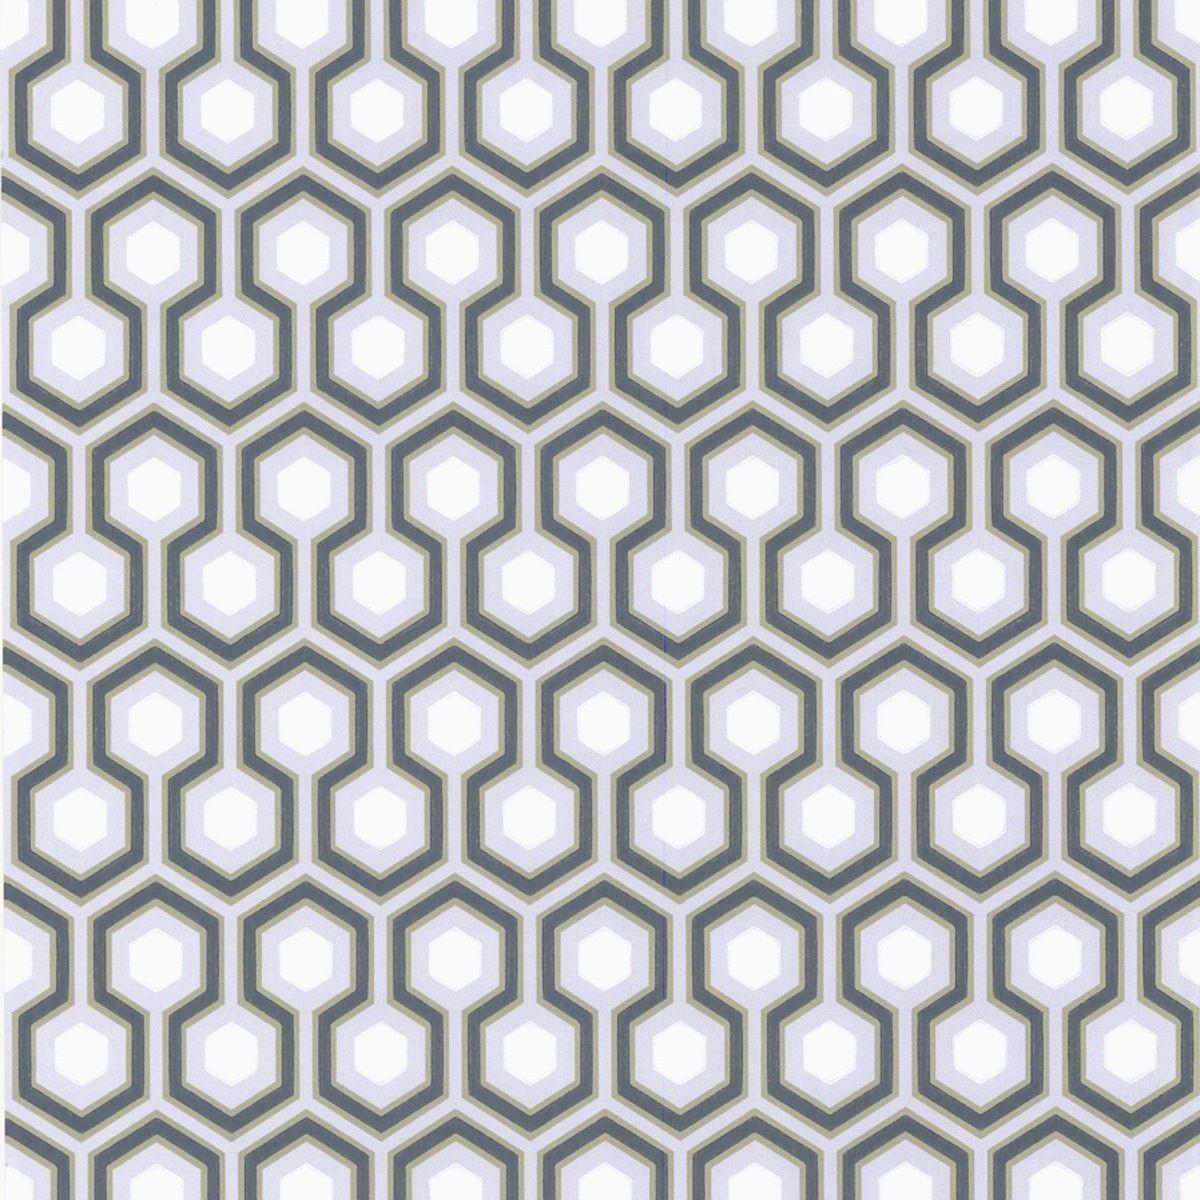 Papier Peint David Hicks papier peint hicks' hexagon - cole and son | hexagon